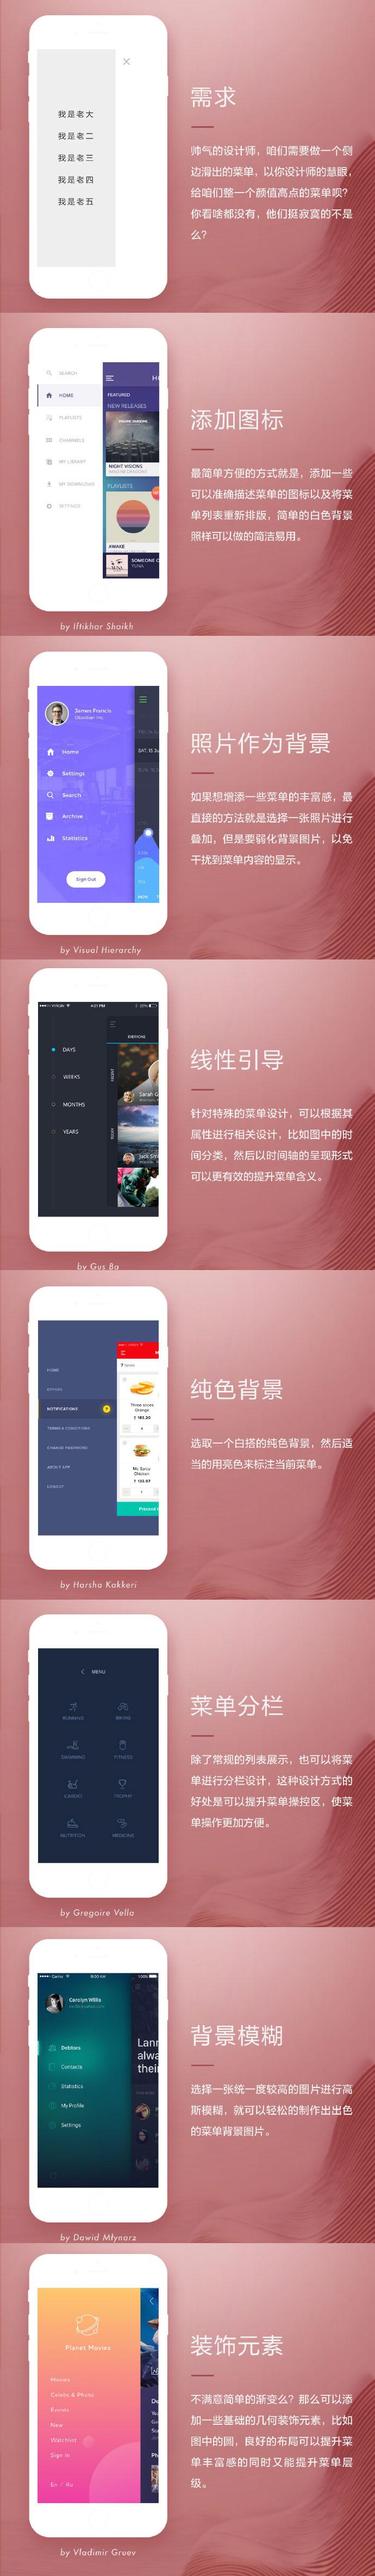 app导航菜单设计方案